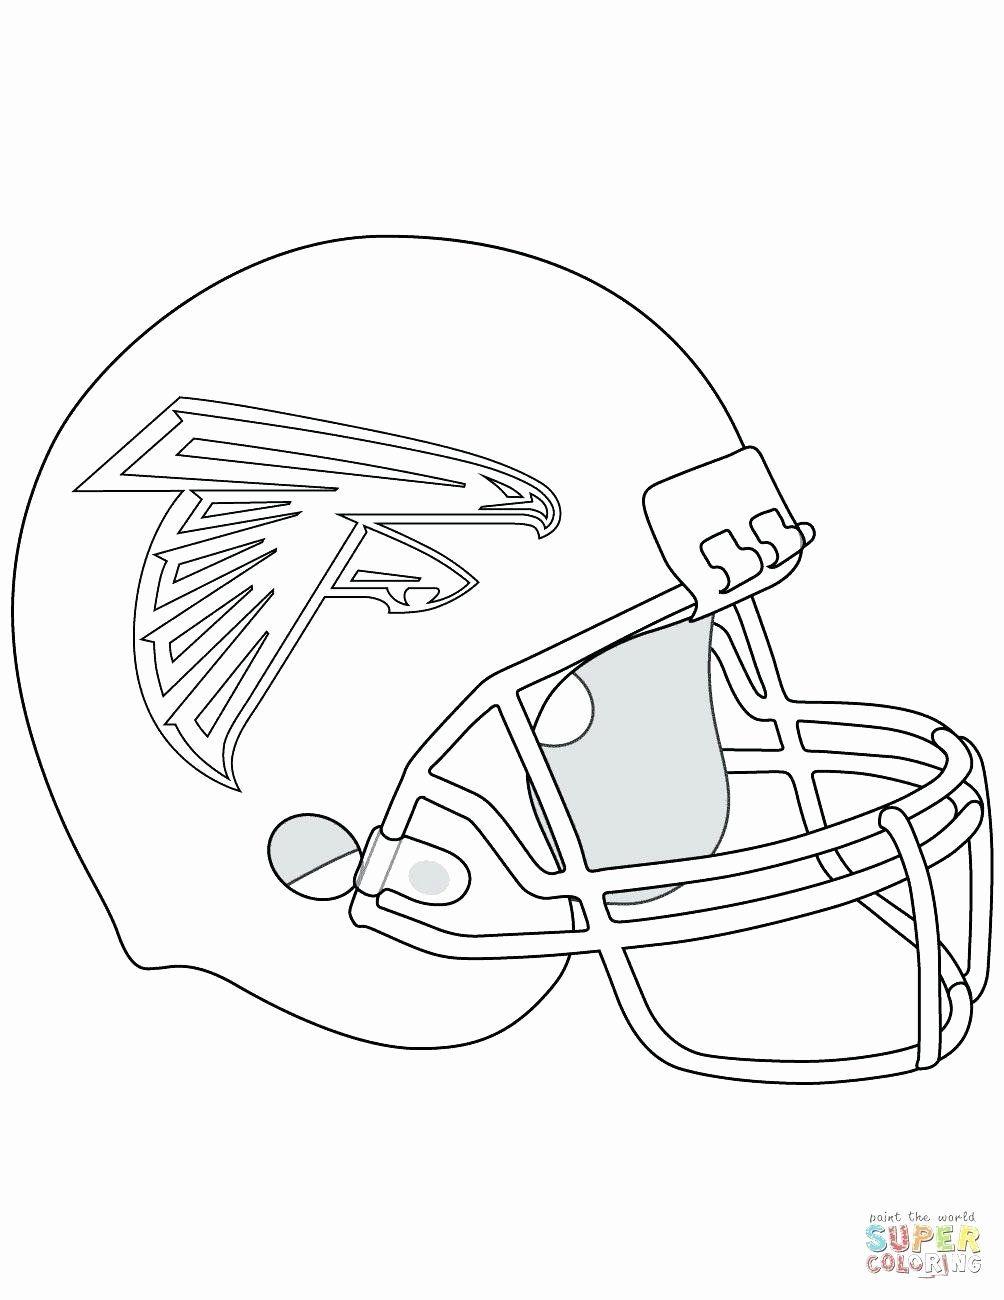 Super Coloring Sport Fresh Seattle Seahawks Coloring Page Redbirdcolor Football Coloring Pages Falcons Helmet Atlanta Falcons Helmet